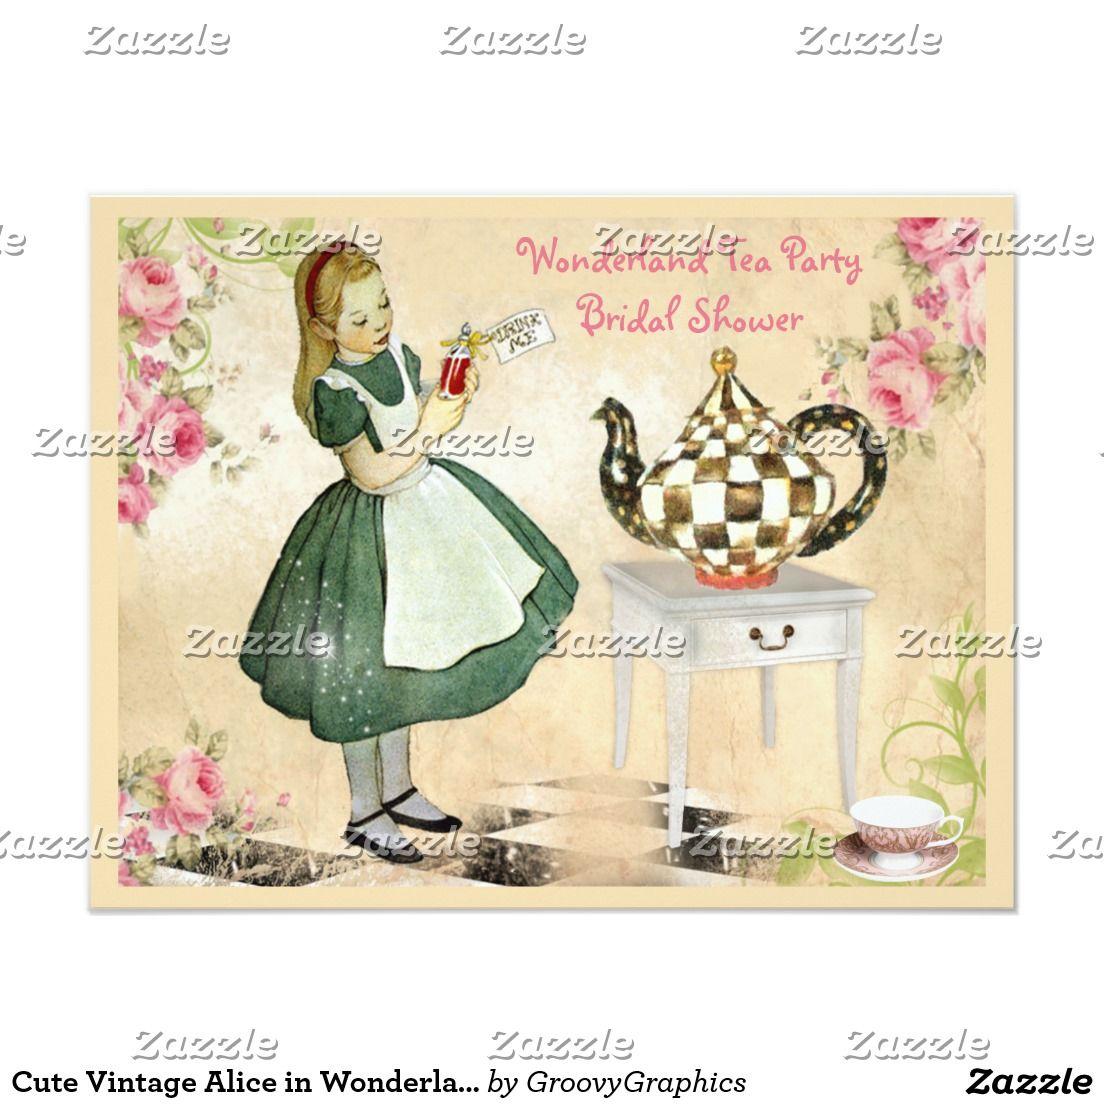 Alice in wonderland themed wedding dress  Cute Vintage Alice in Wonderland Bridal Shower  WEDDING BRIDAL